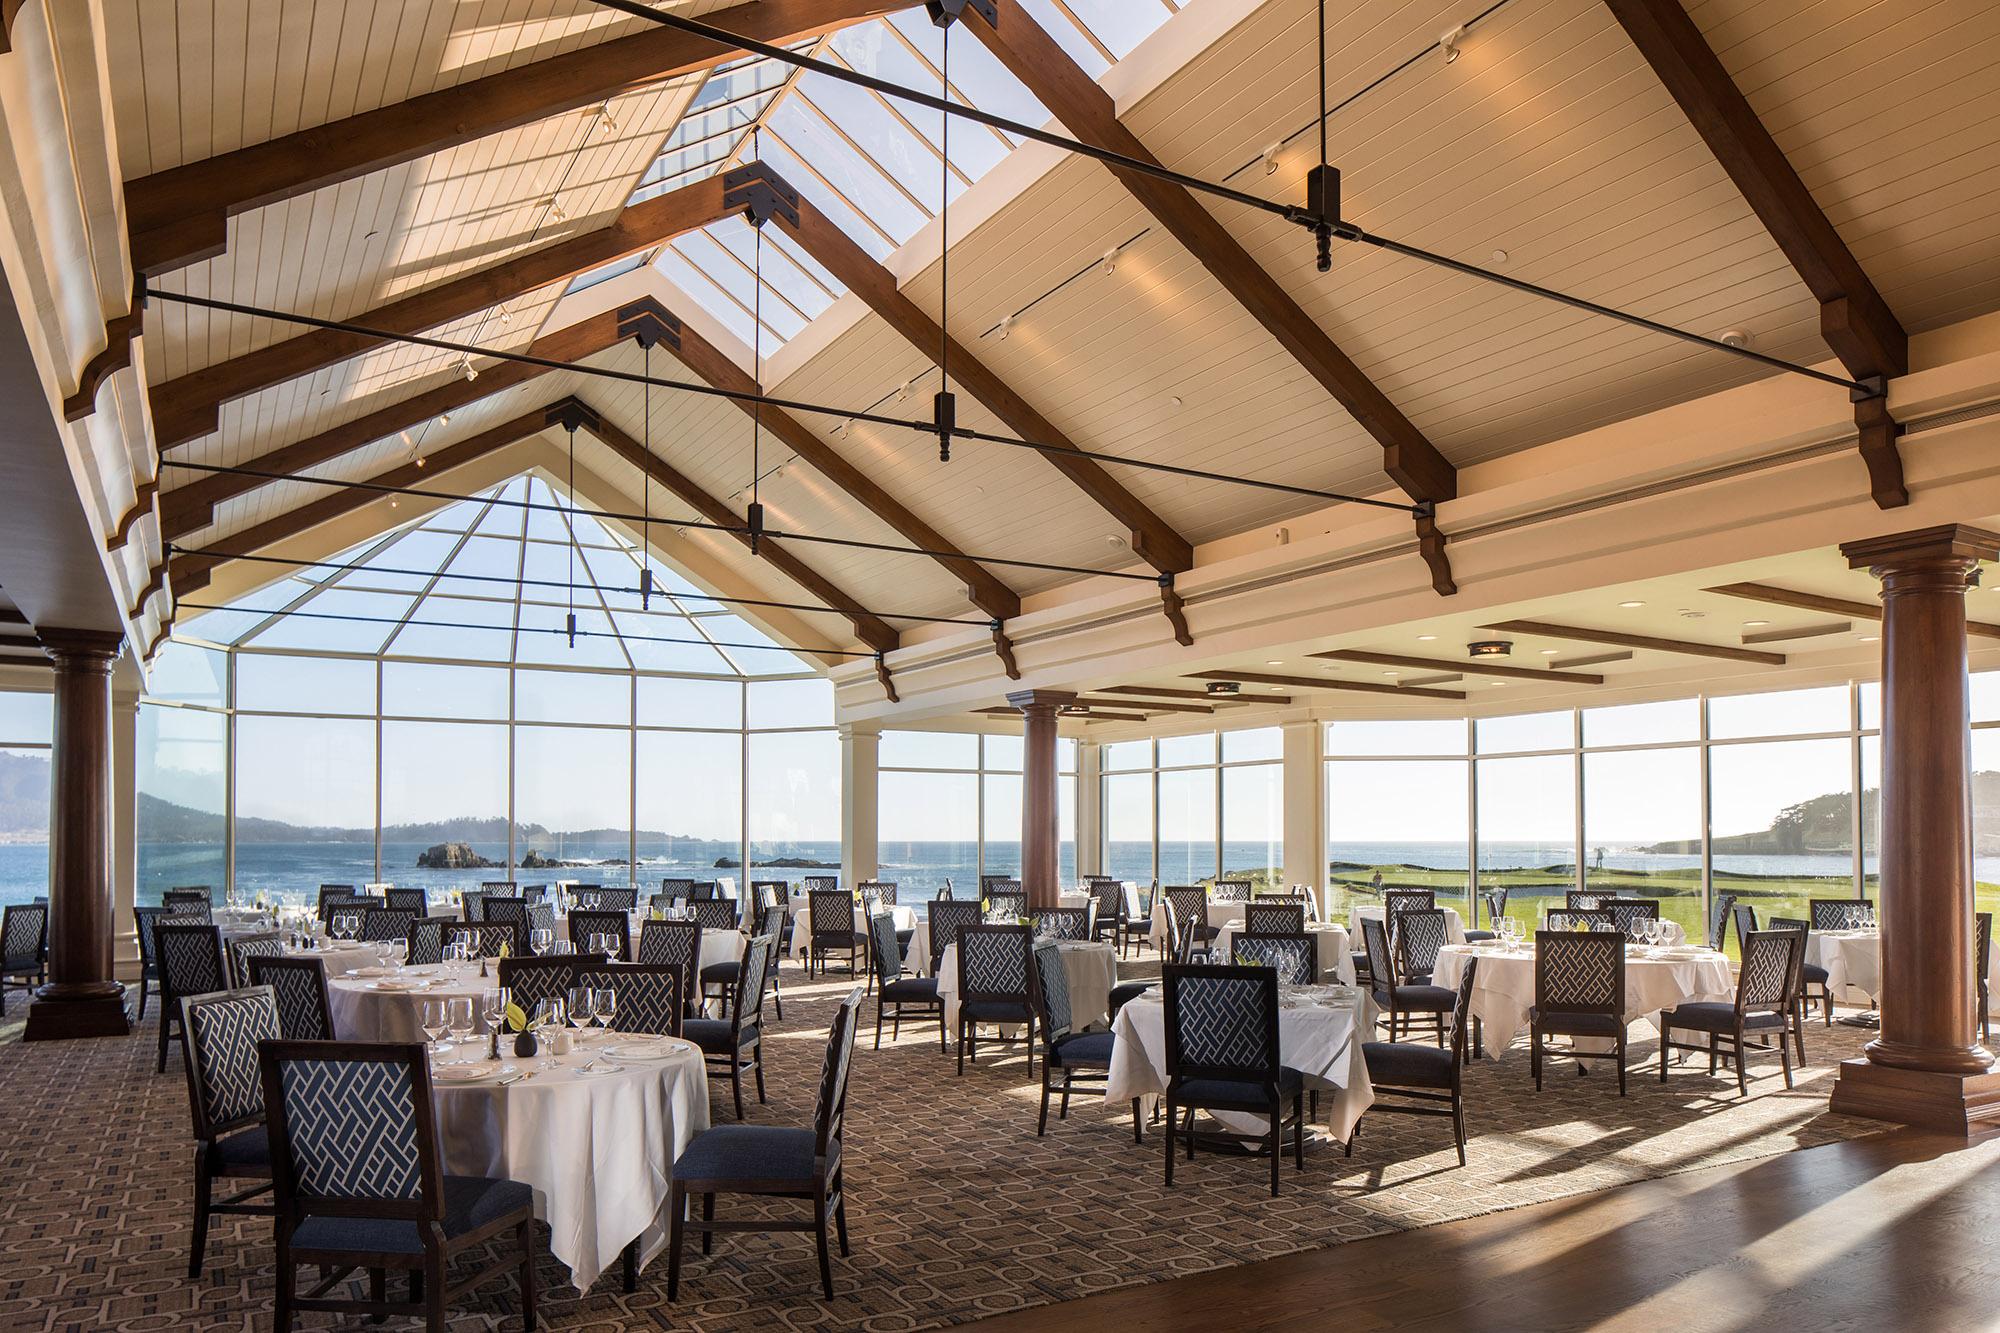 The Beach Club Dining Room